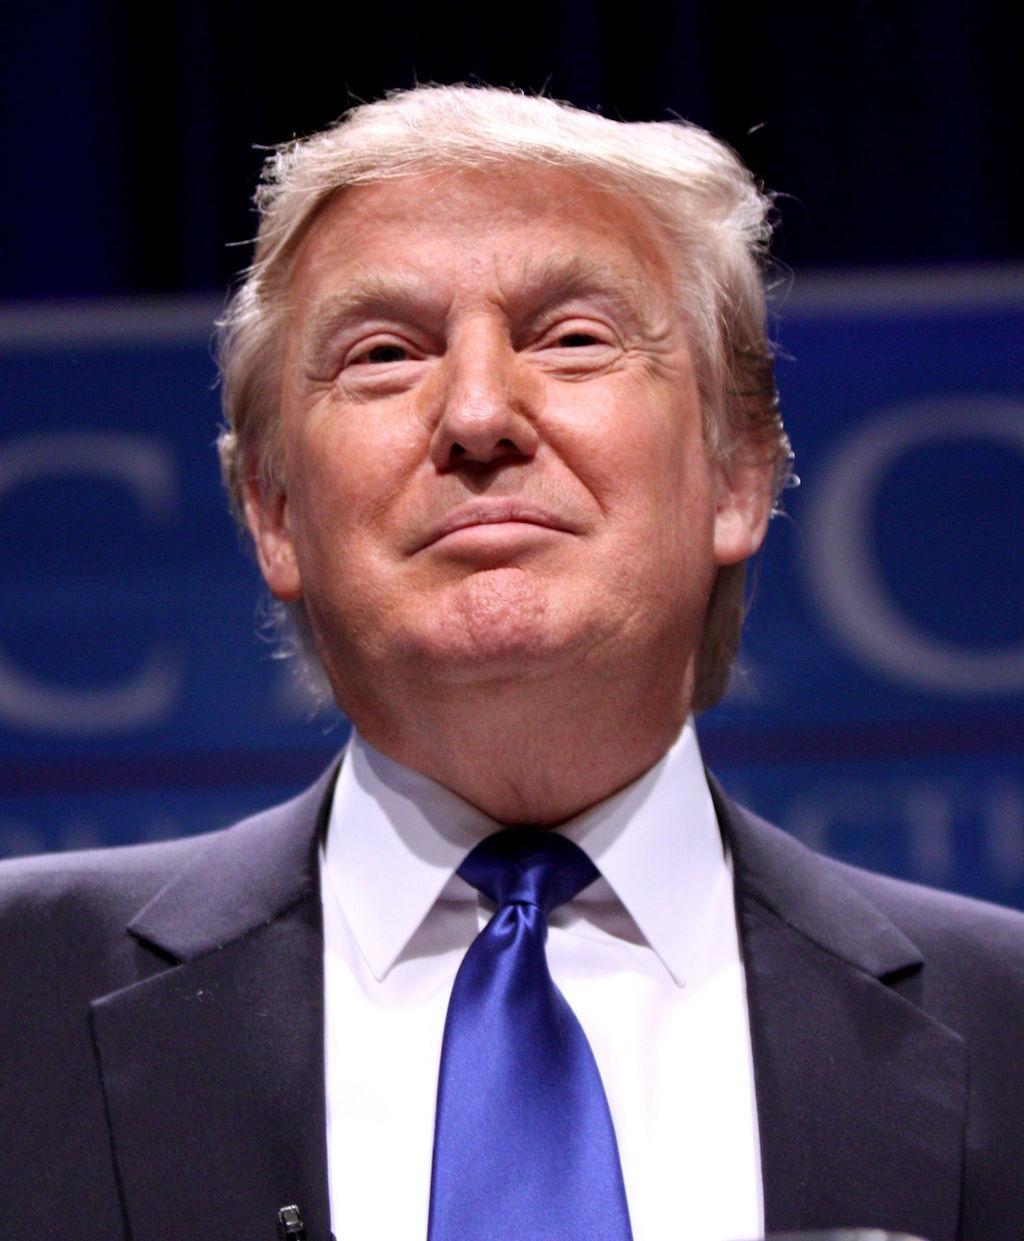 Documentaire : L'inquiétant Mr Trump, de Romain Besnainou